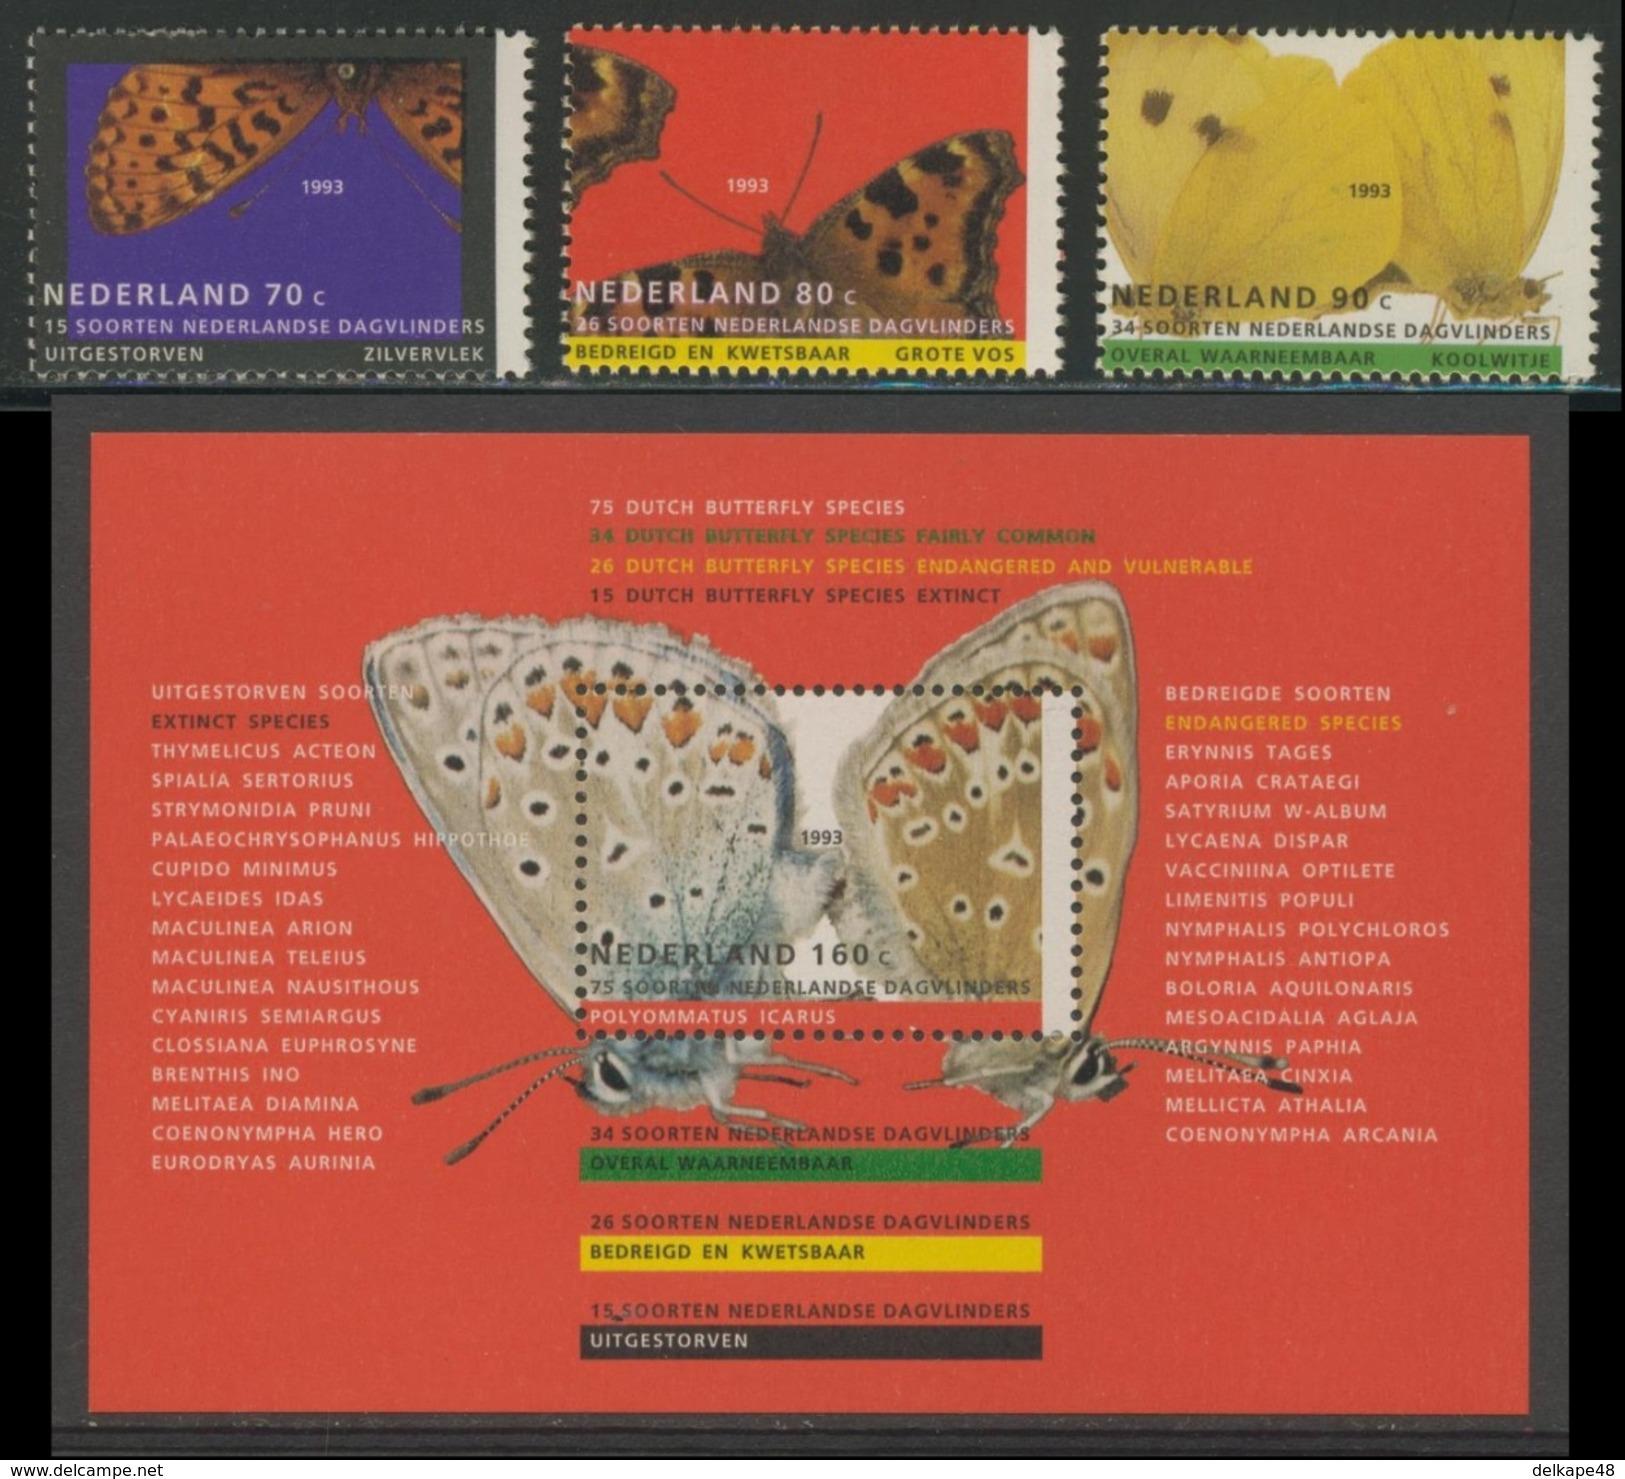 Nederland Netherlands Pays Bas 1993 Mi 1470 /2 + B 38 ** Butterflies / Schmetterlinge / Papillons / Vlinders - Vlinders